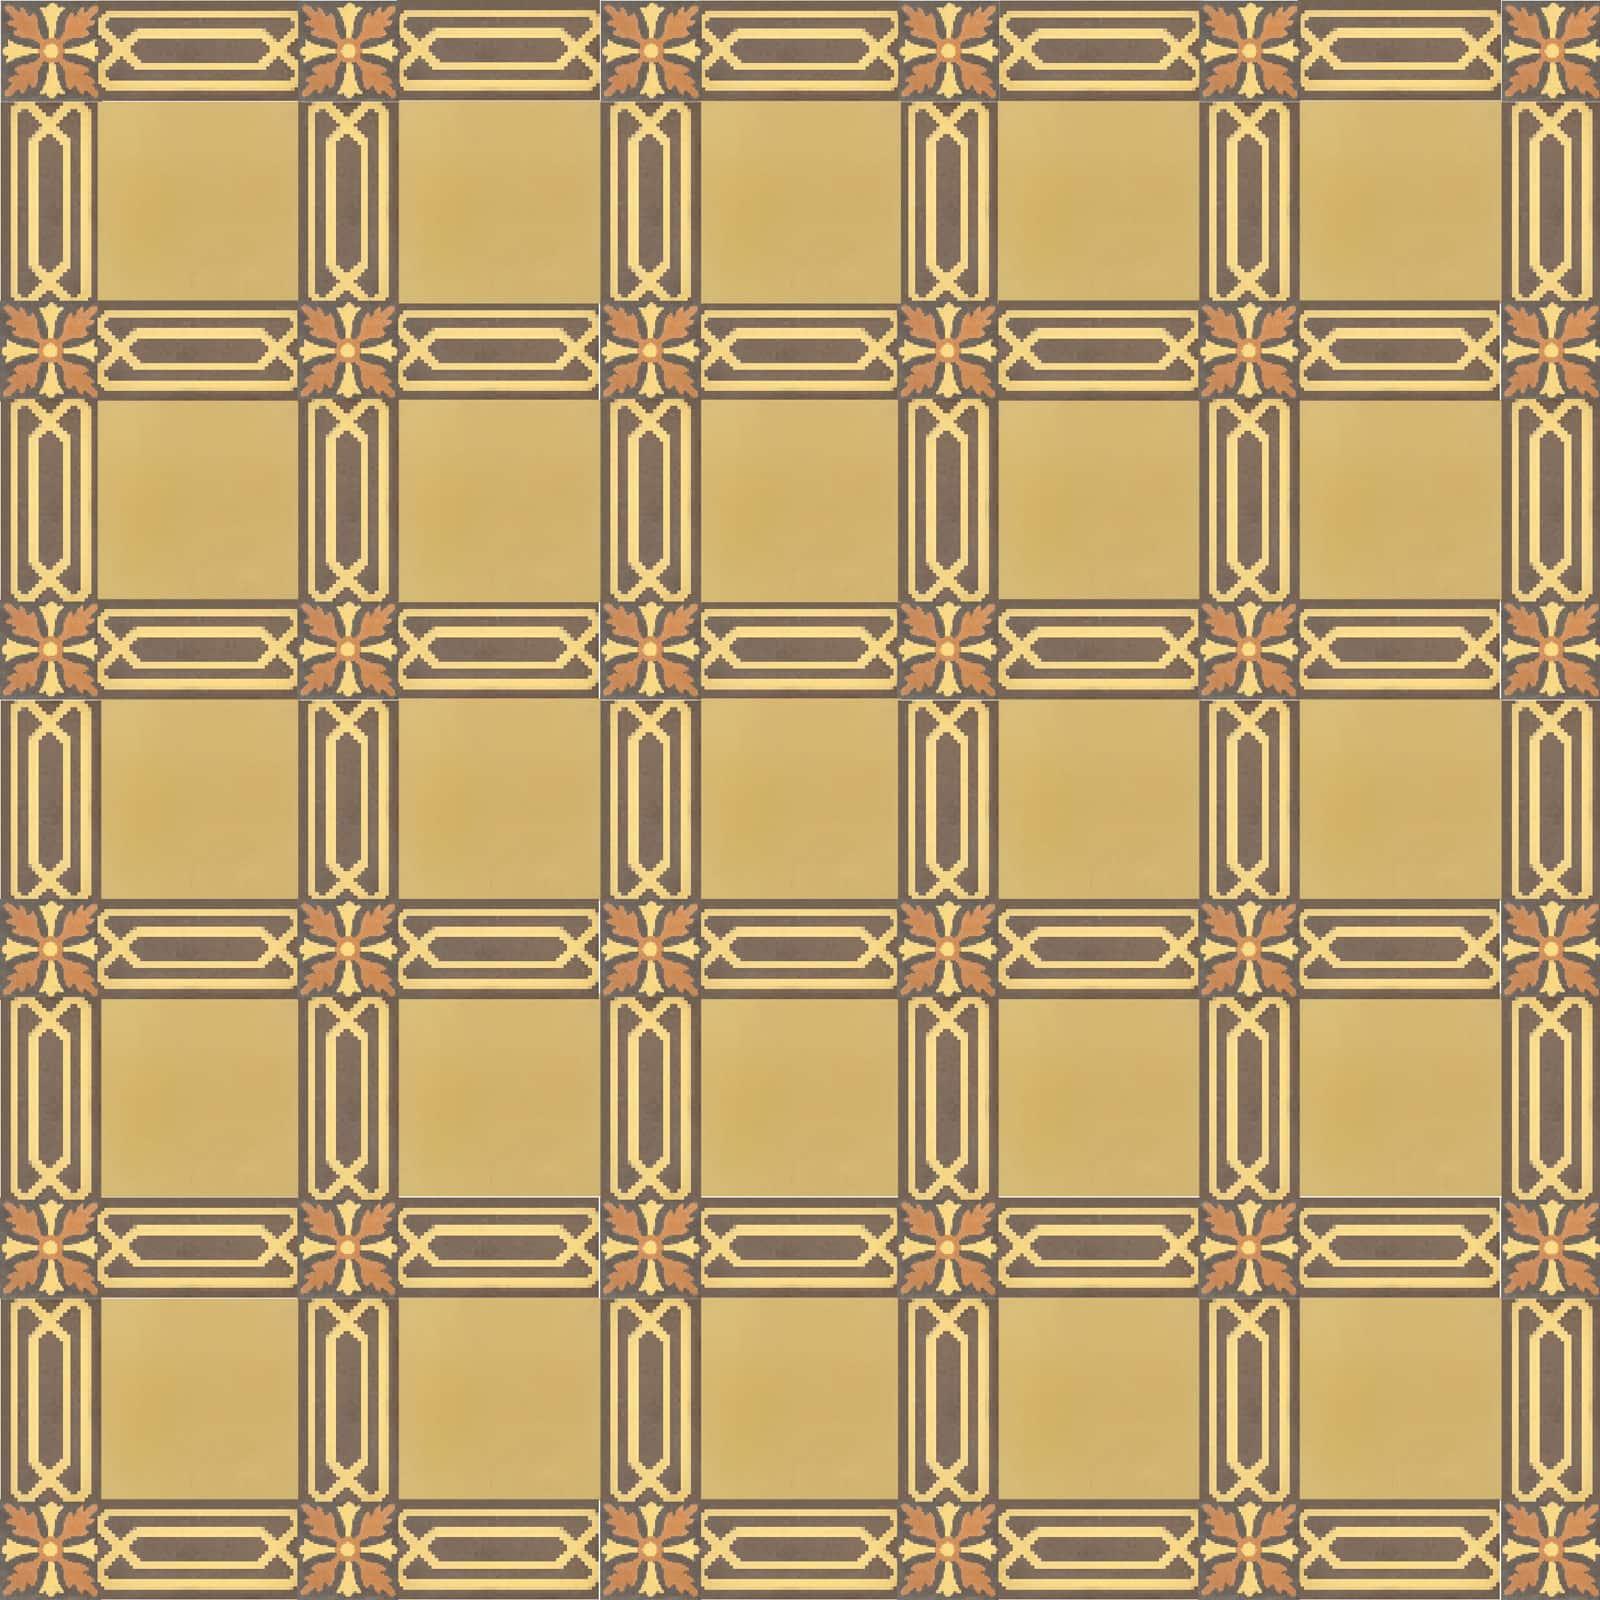 zementfliesen-terrazzofliesen-kreidefarbe-terrazzo-fugenlos-viaplatten-52030 | 53030/70